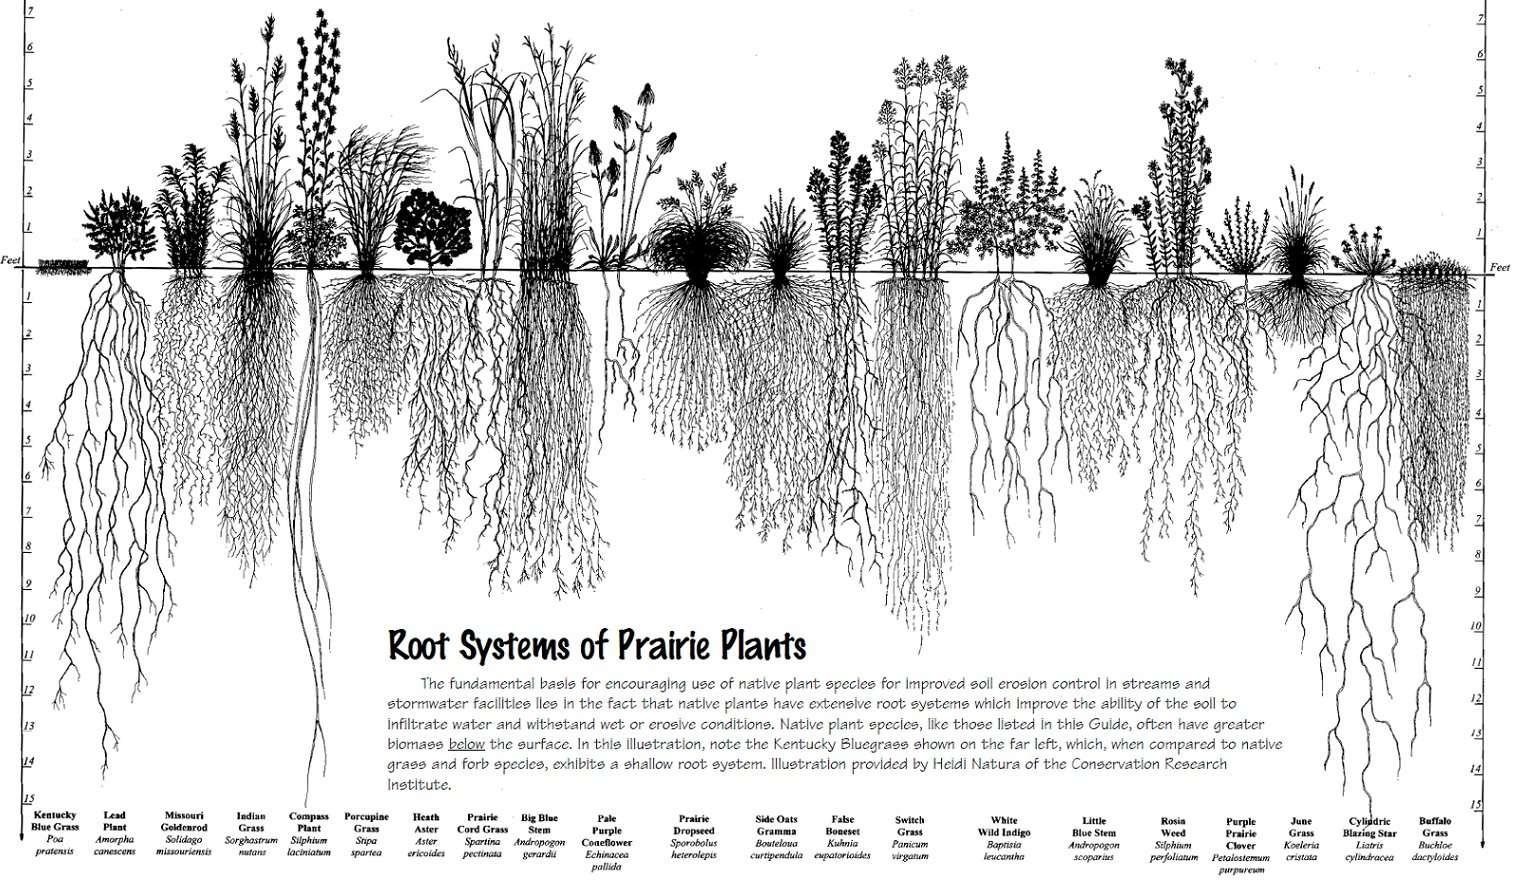 prairierootsystems-1